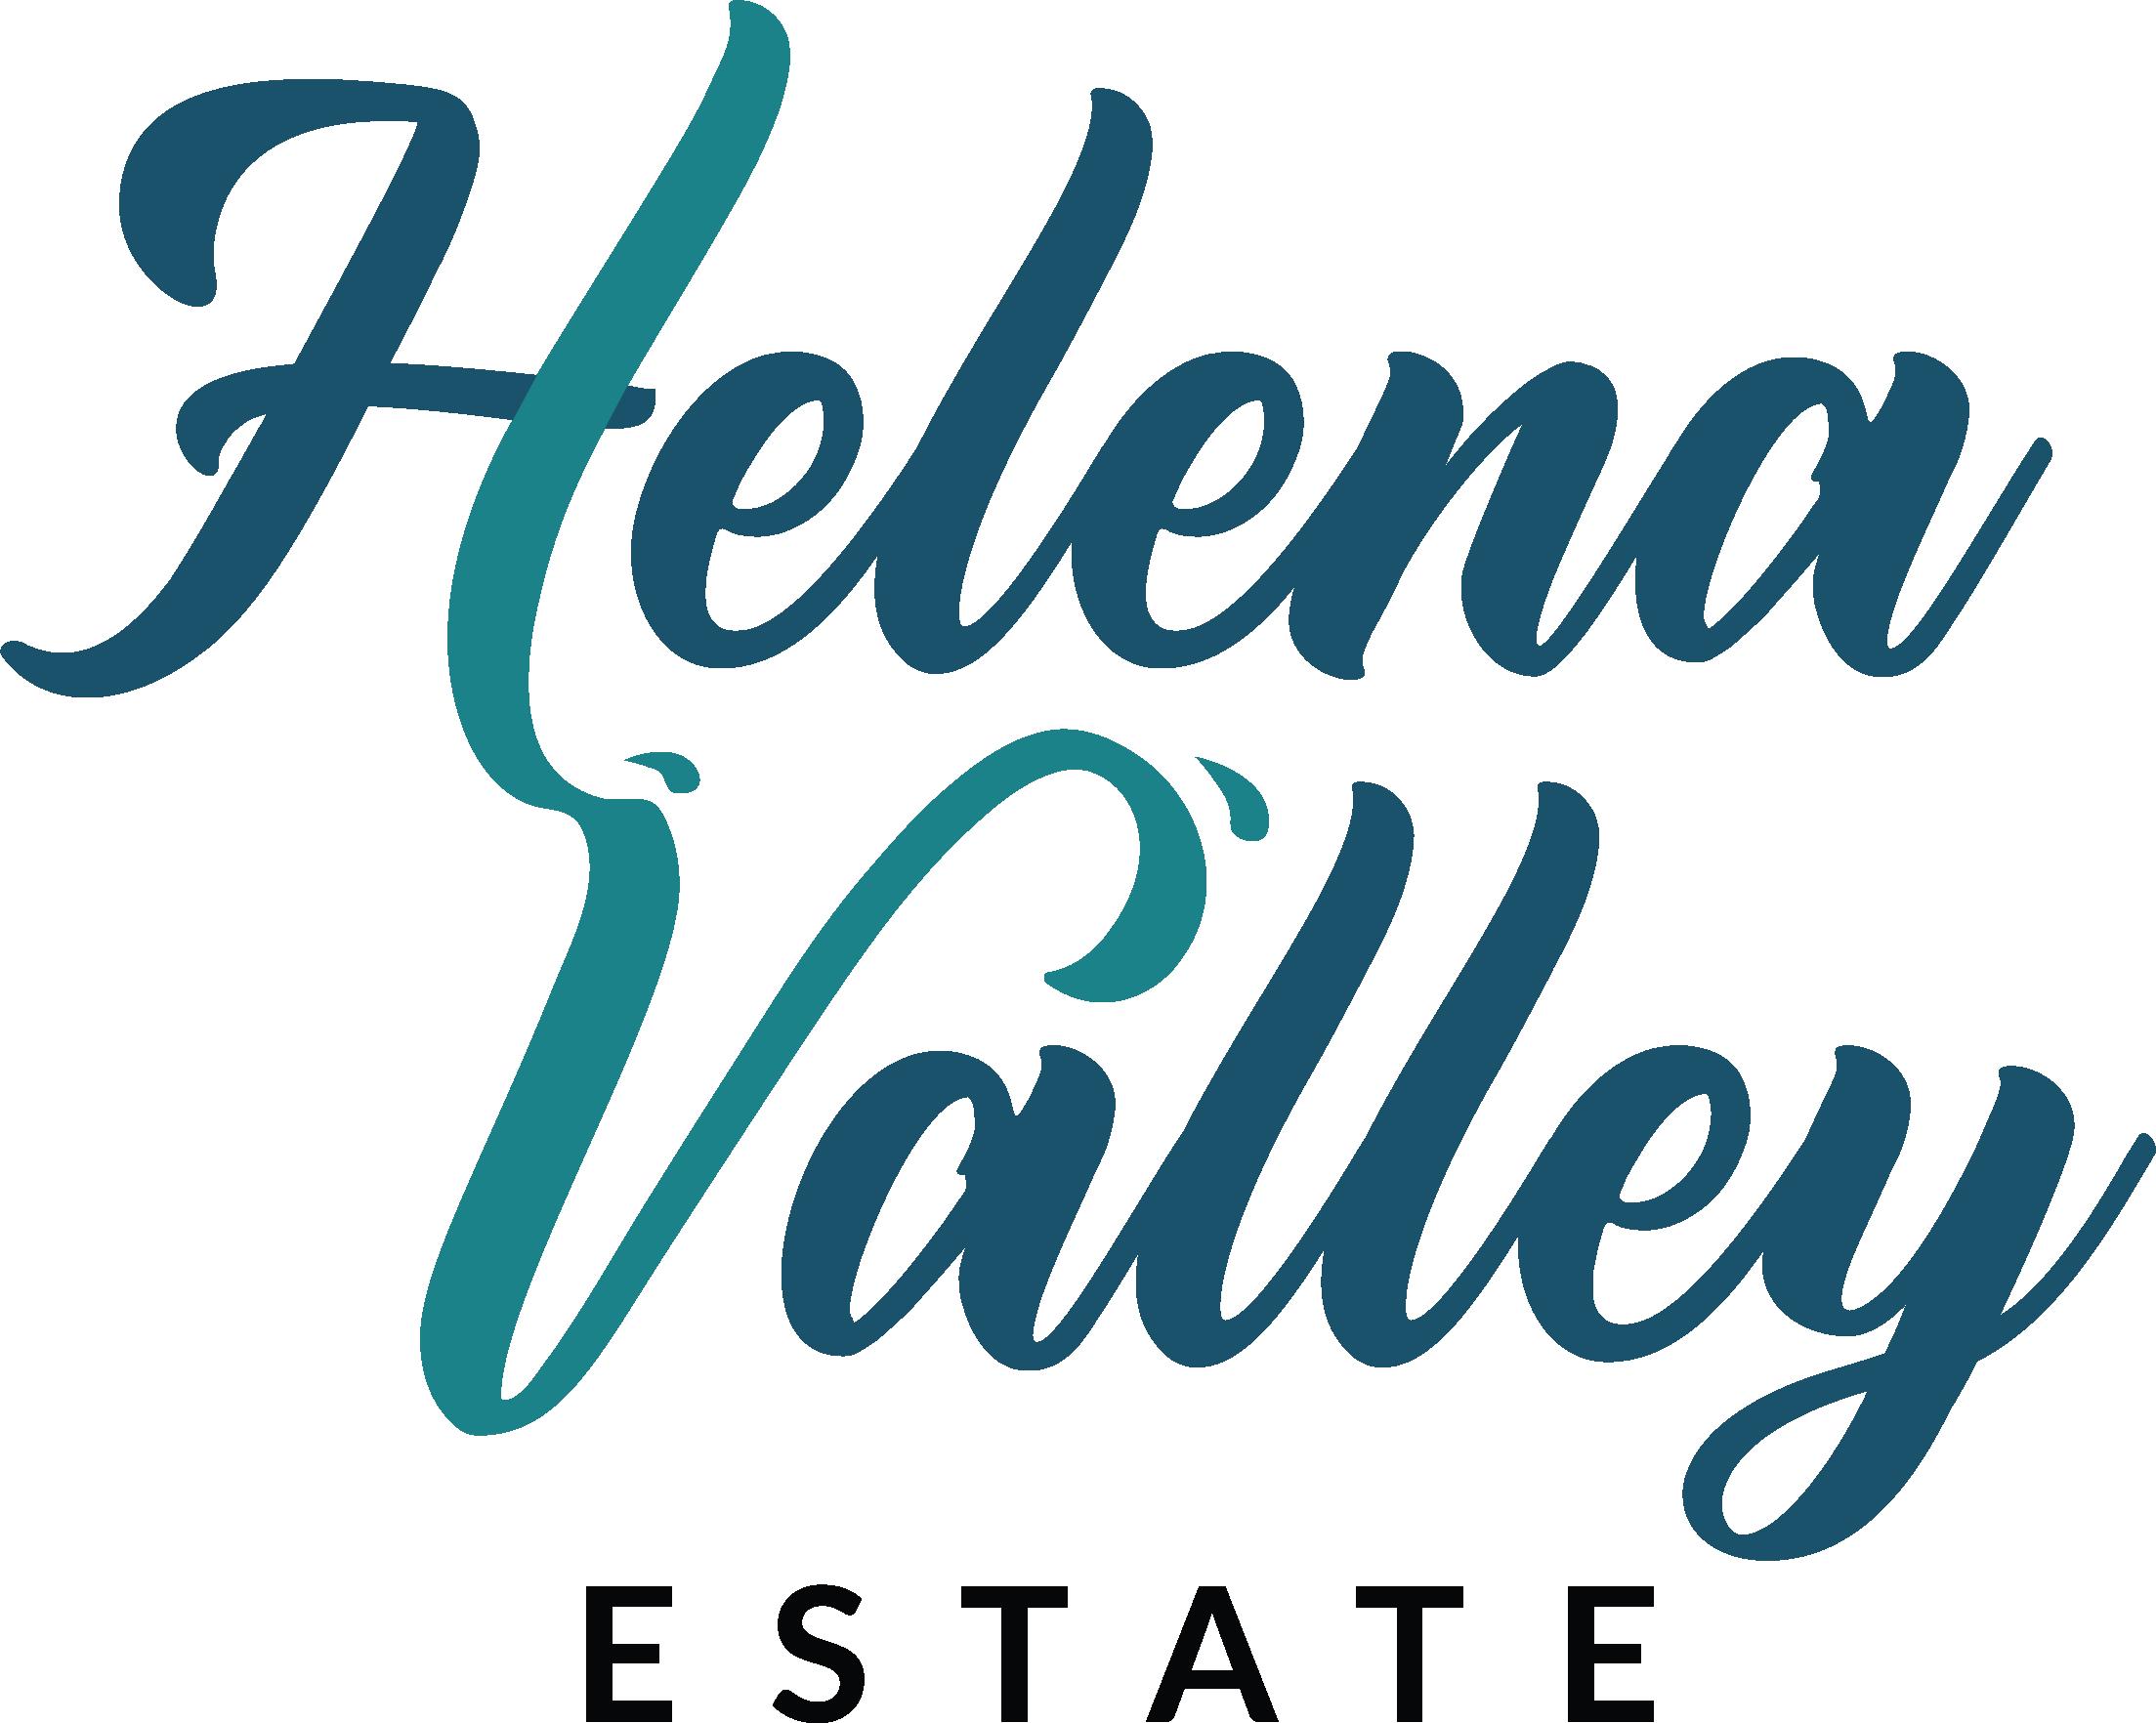 Helena Valley Estate